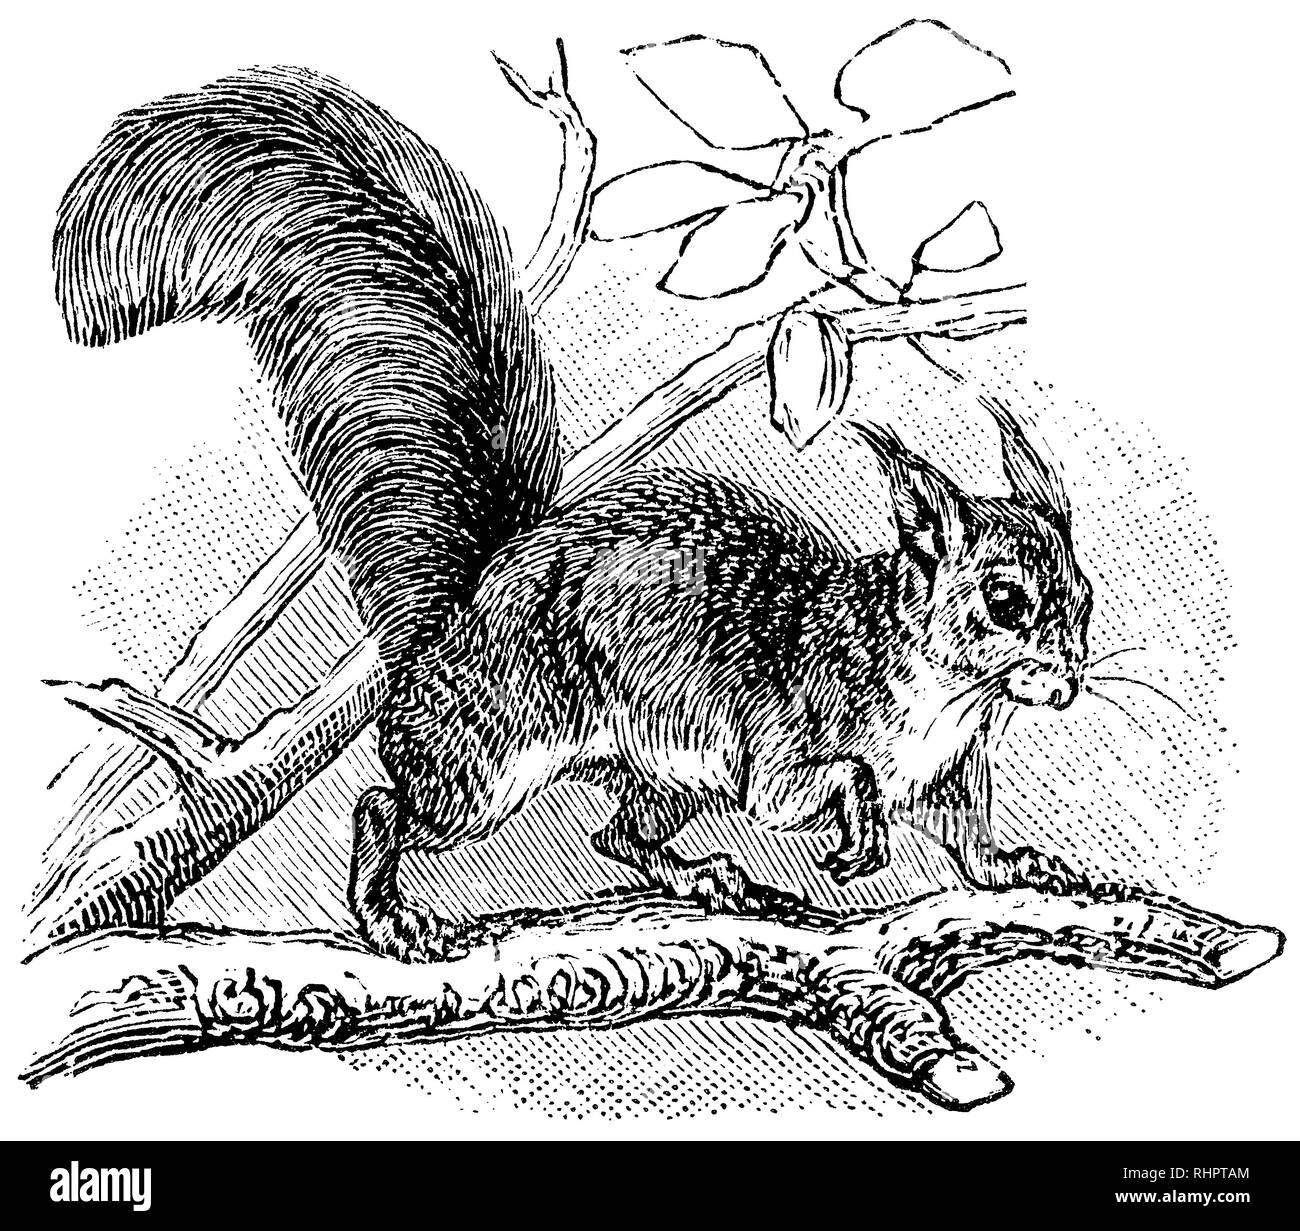 1902 Grabado de Un Euroasiático de ardilla roja (Sciurus vulgaris). Imagen De Stock